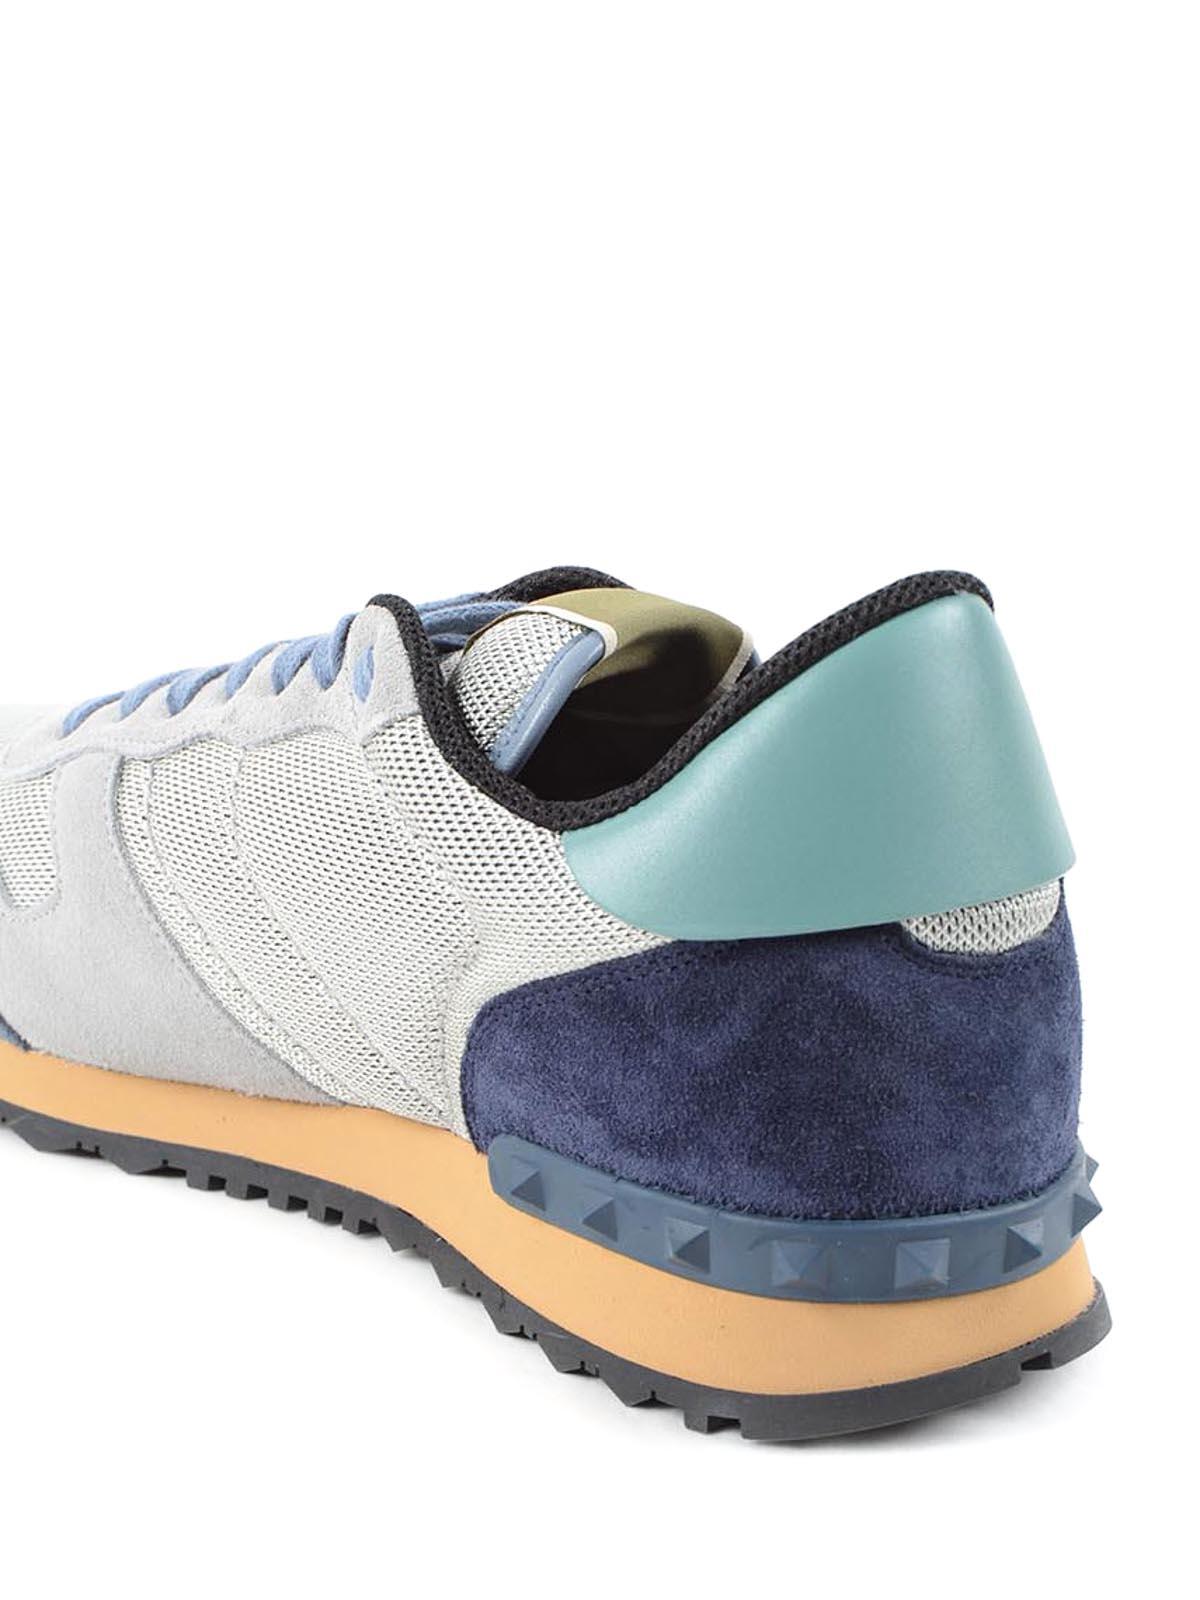 fceae56747d iKRIX VALENTINO GARAVANI  Chaussures de sport - Baskets Rockrunner Pour  Homme